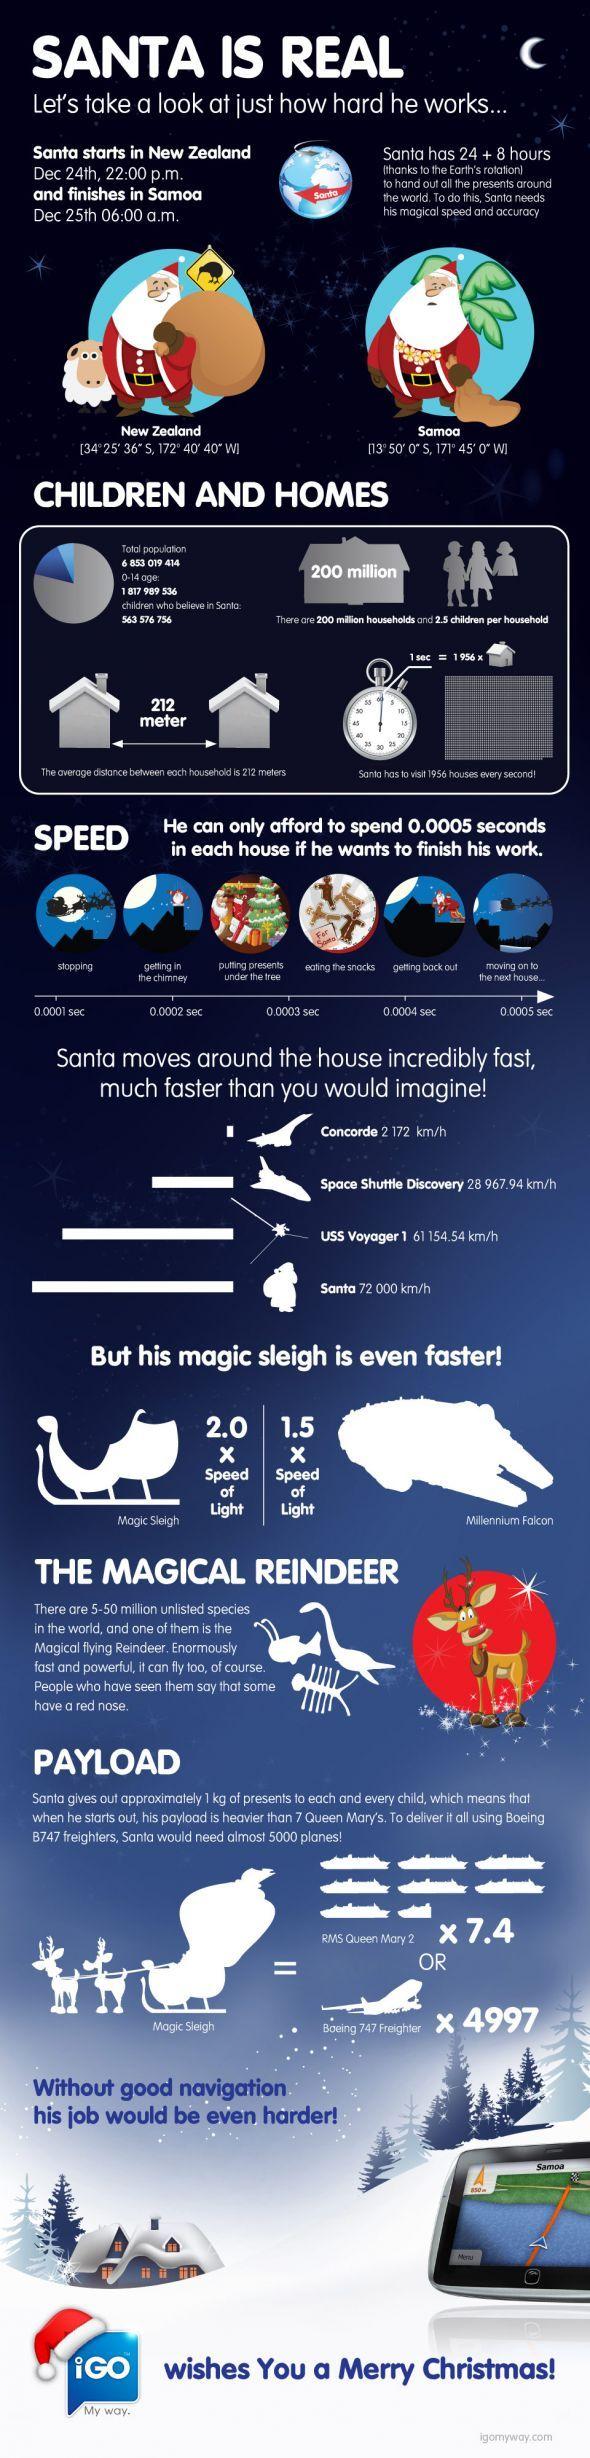 Santa is real | #santa #xmas #reindeers #christmas #fun #facts #information #design